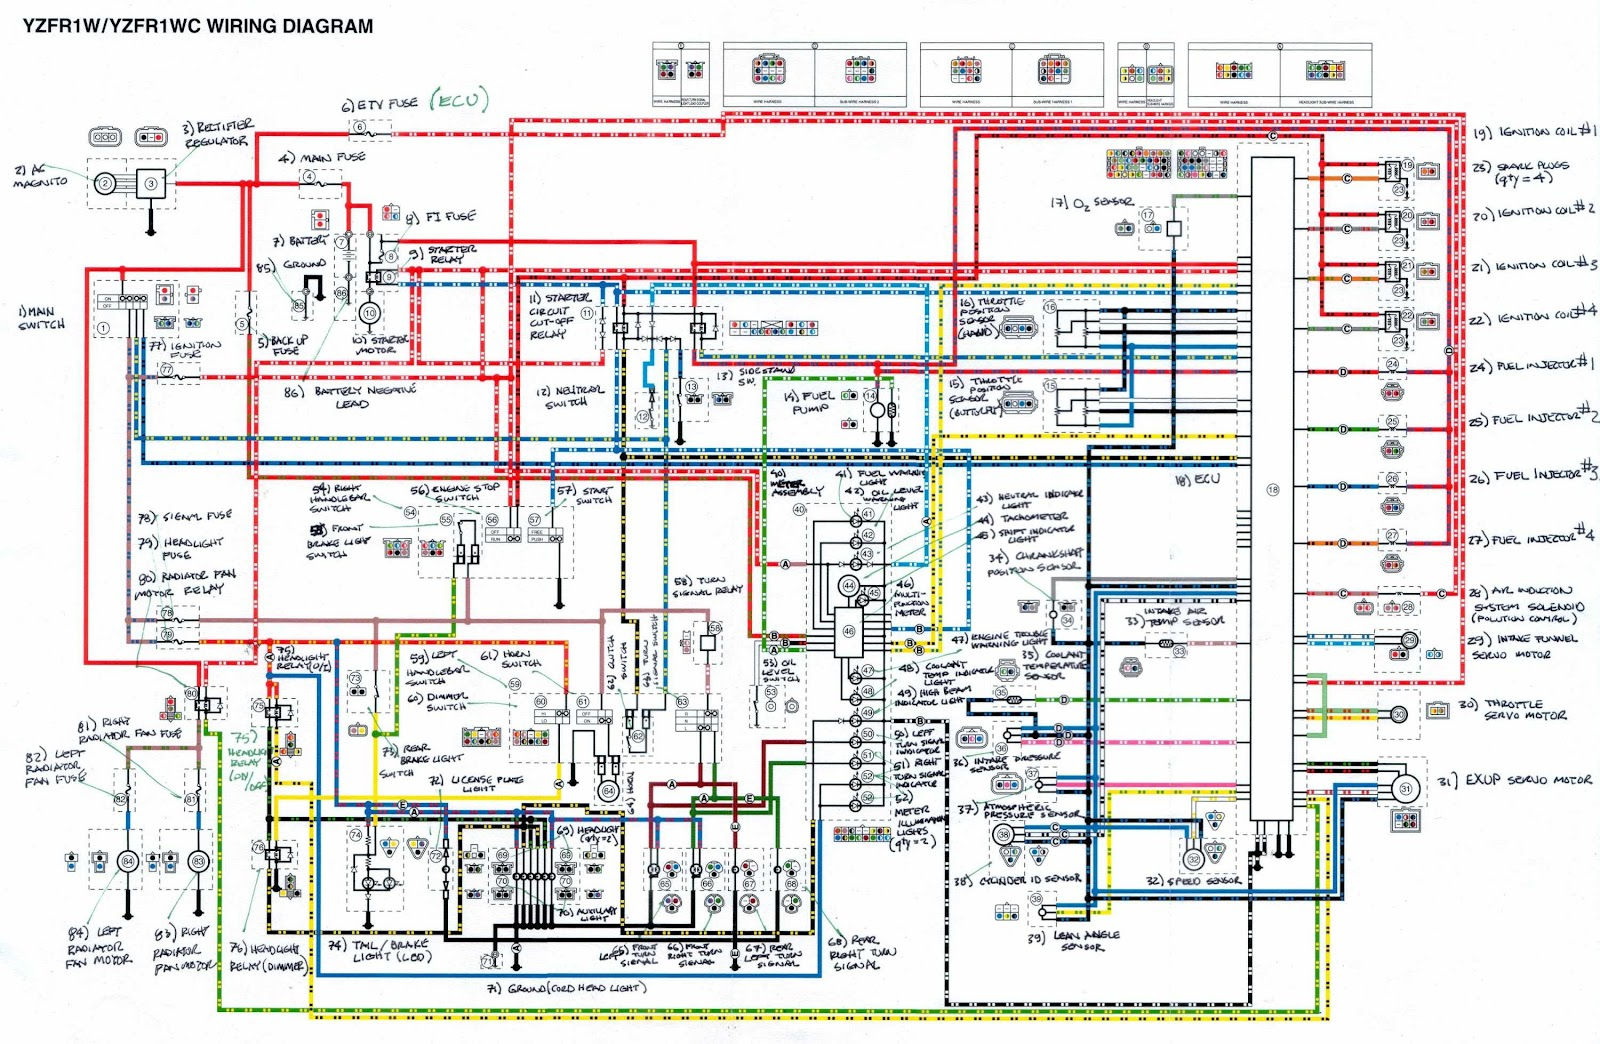 medium resolution of wiring diagram for triumph tr7 1976 6 1980 mgb wiring diagram wiring diagram for